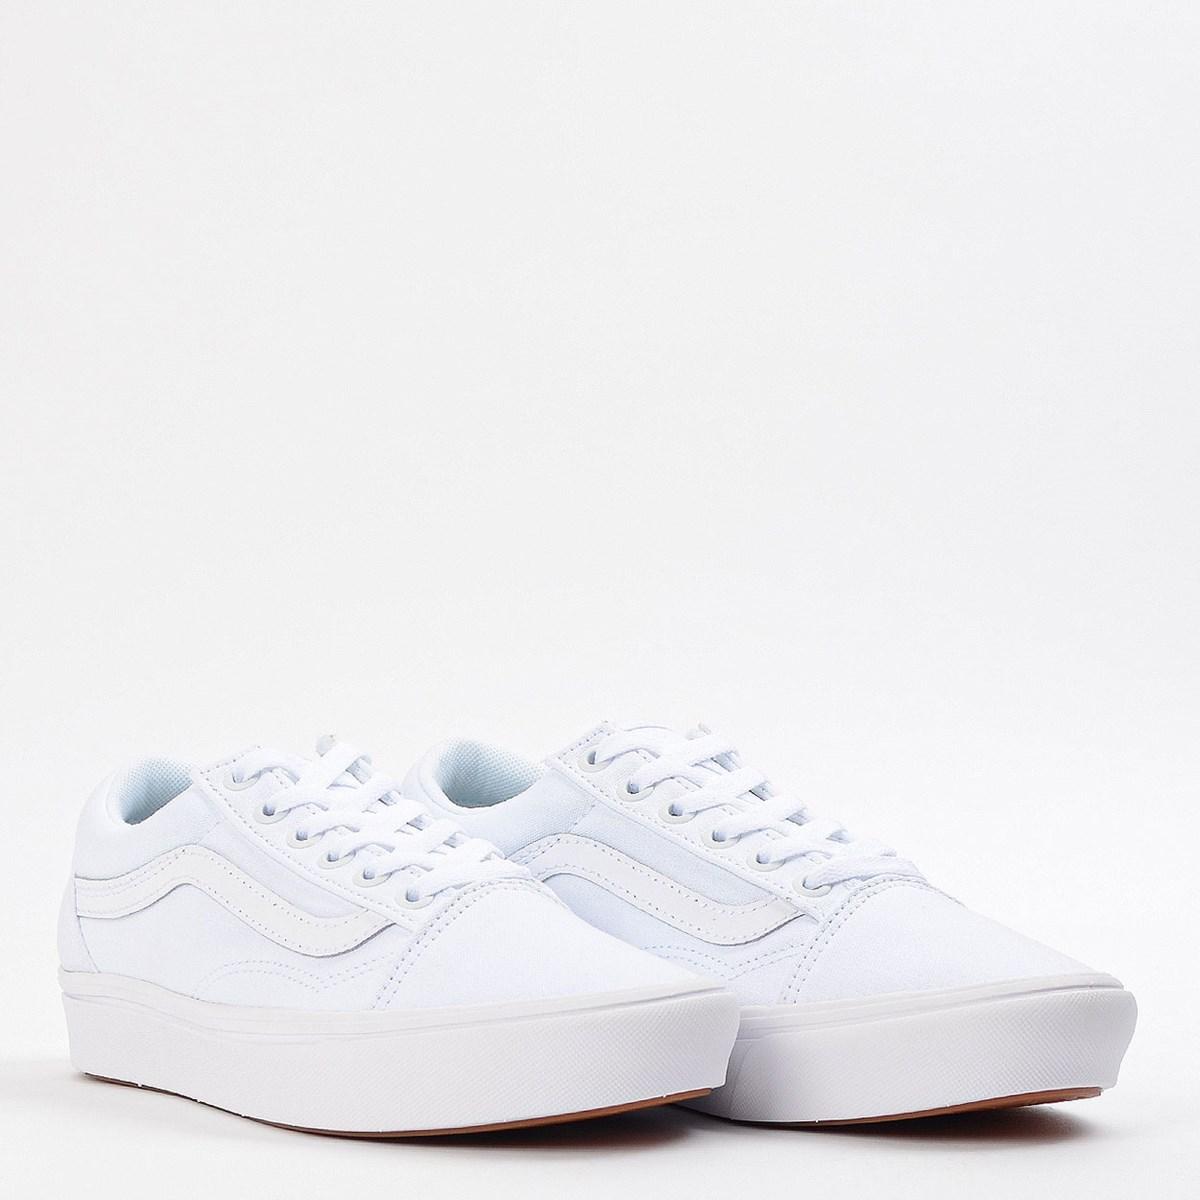 Tênis Vans Comfycush Old Skool Classic True White True White VN0A3WMAVNG